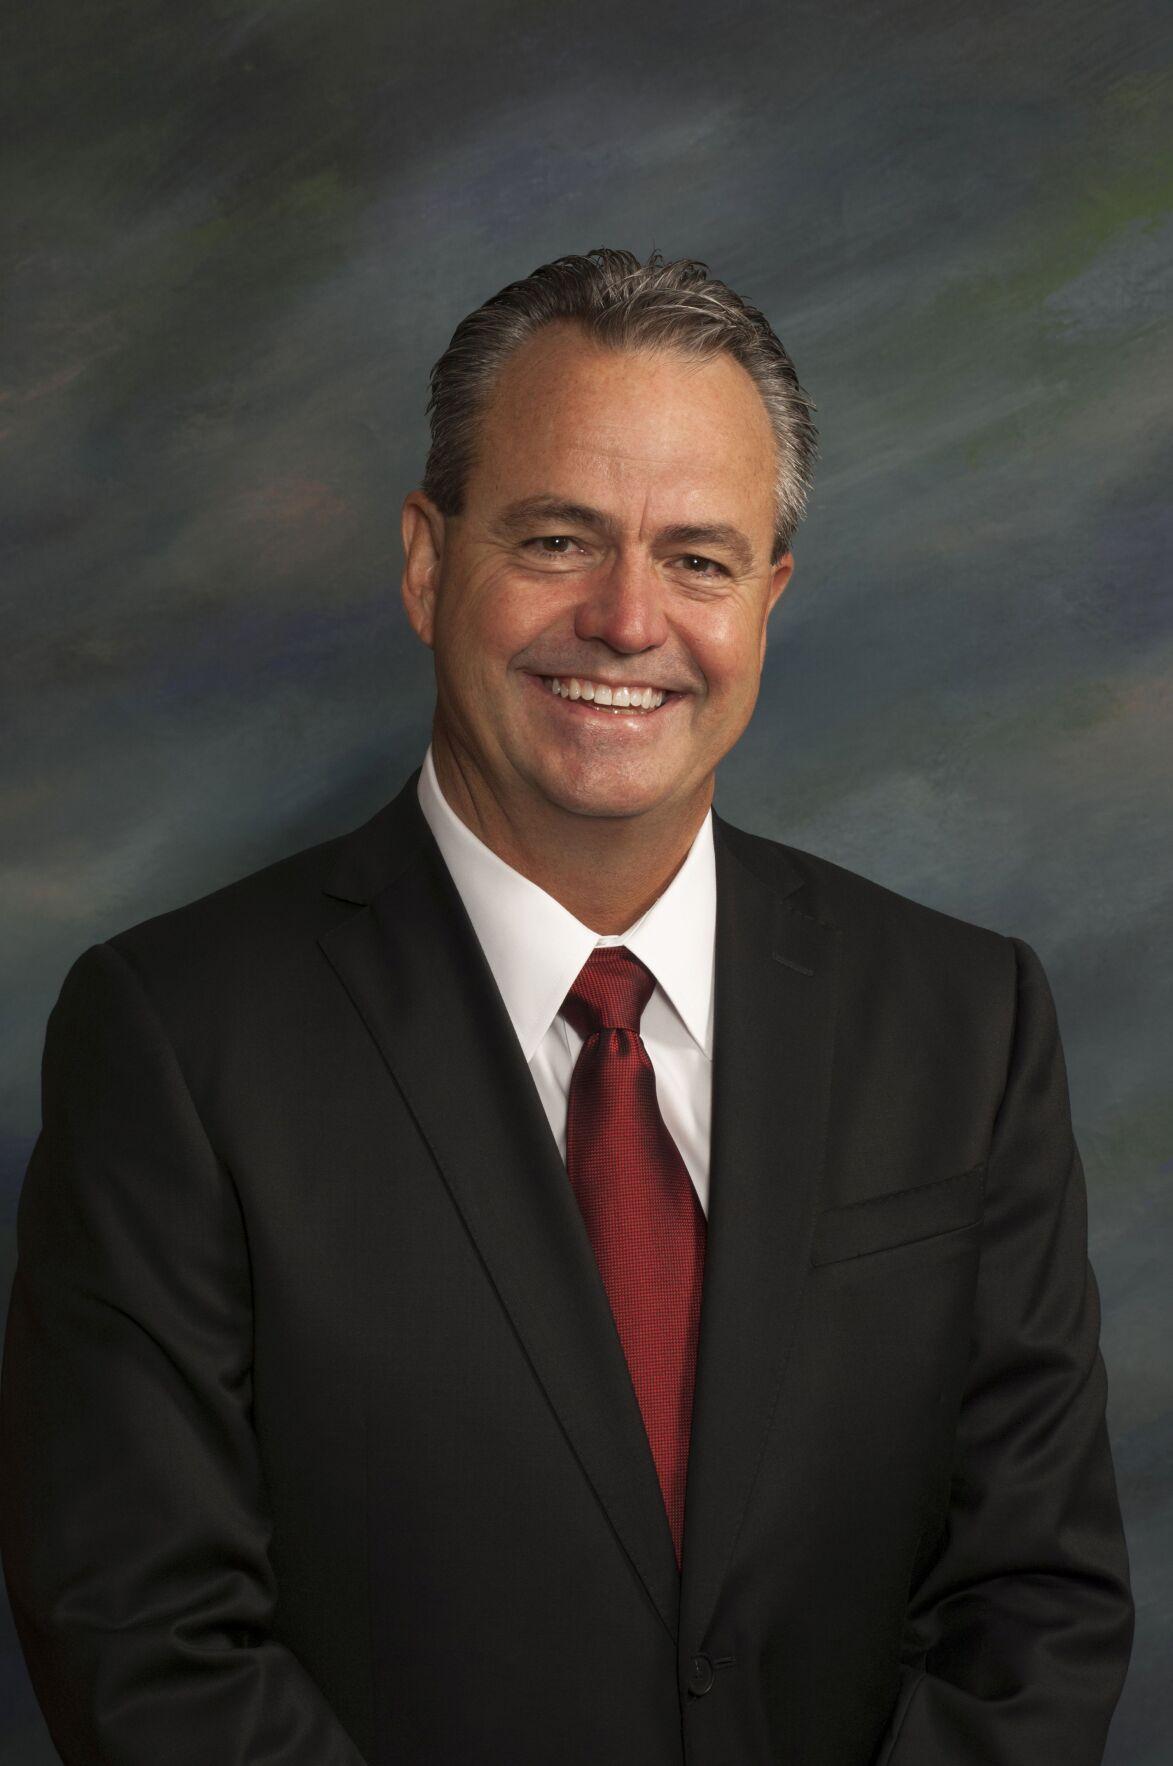 Tony Frankenberger